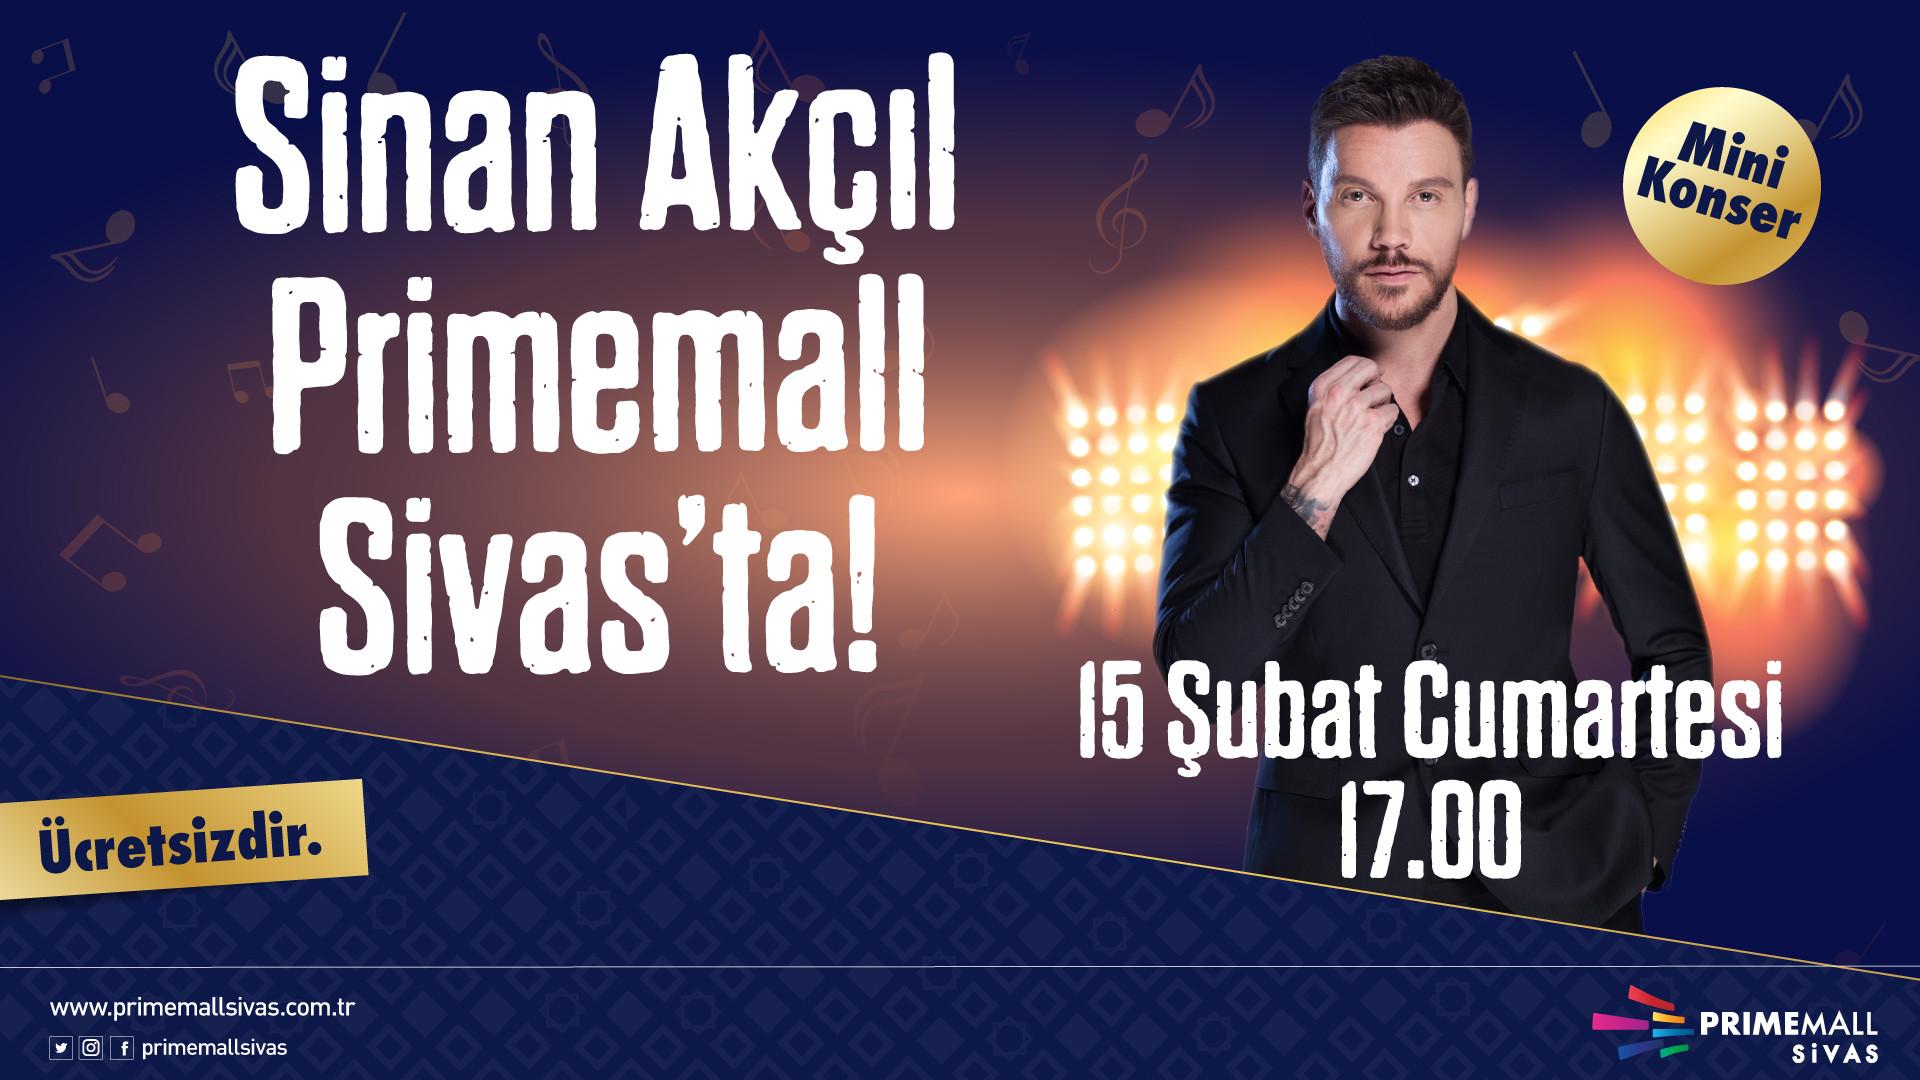 Sinan Akçıl Primemall Sivas'ta!